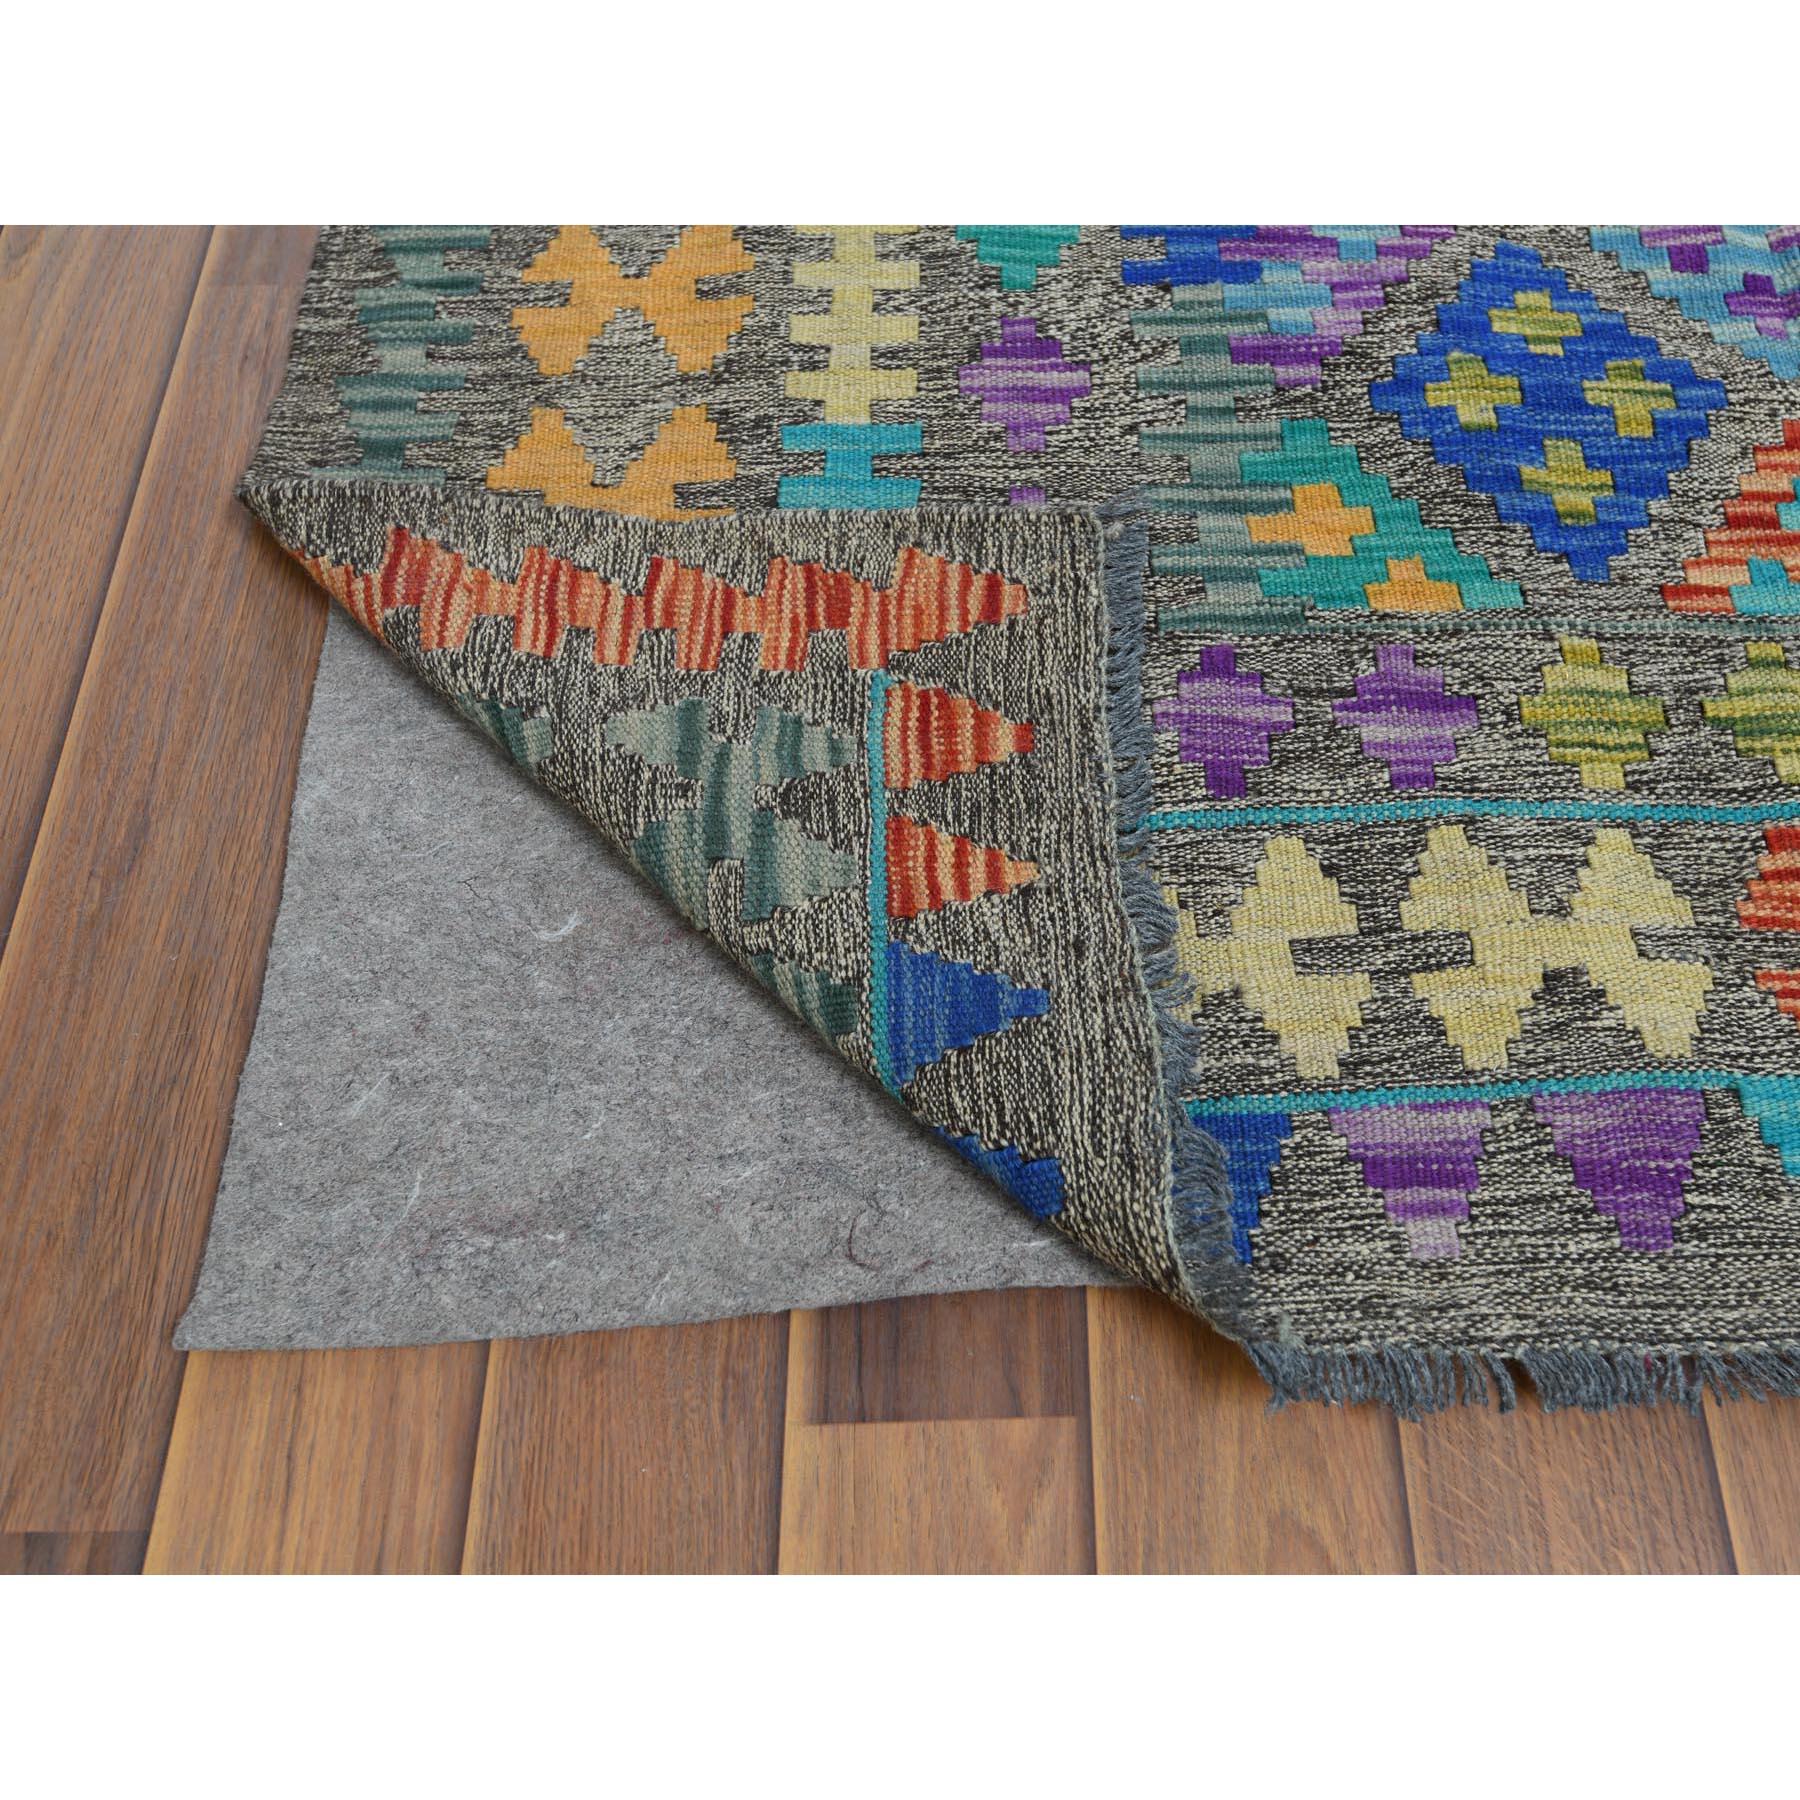 "8'7""x11'8"" Hand Spun Wool Colorful Afghan Kilim Nomadic Design Hand Woven Oriental Reversible Rug"